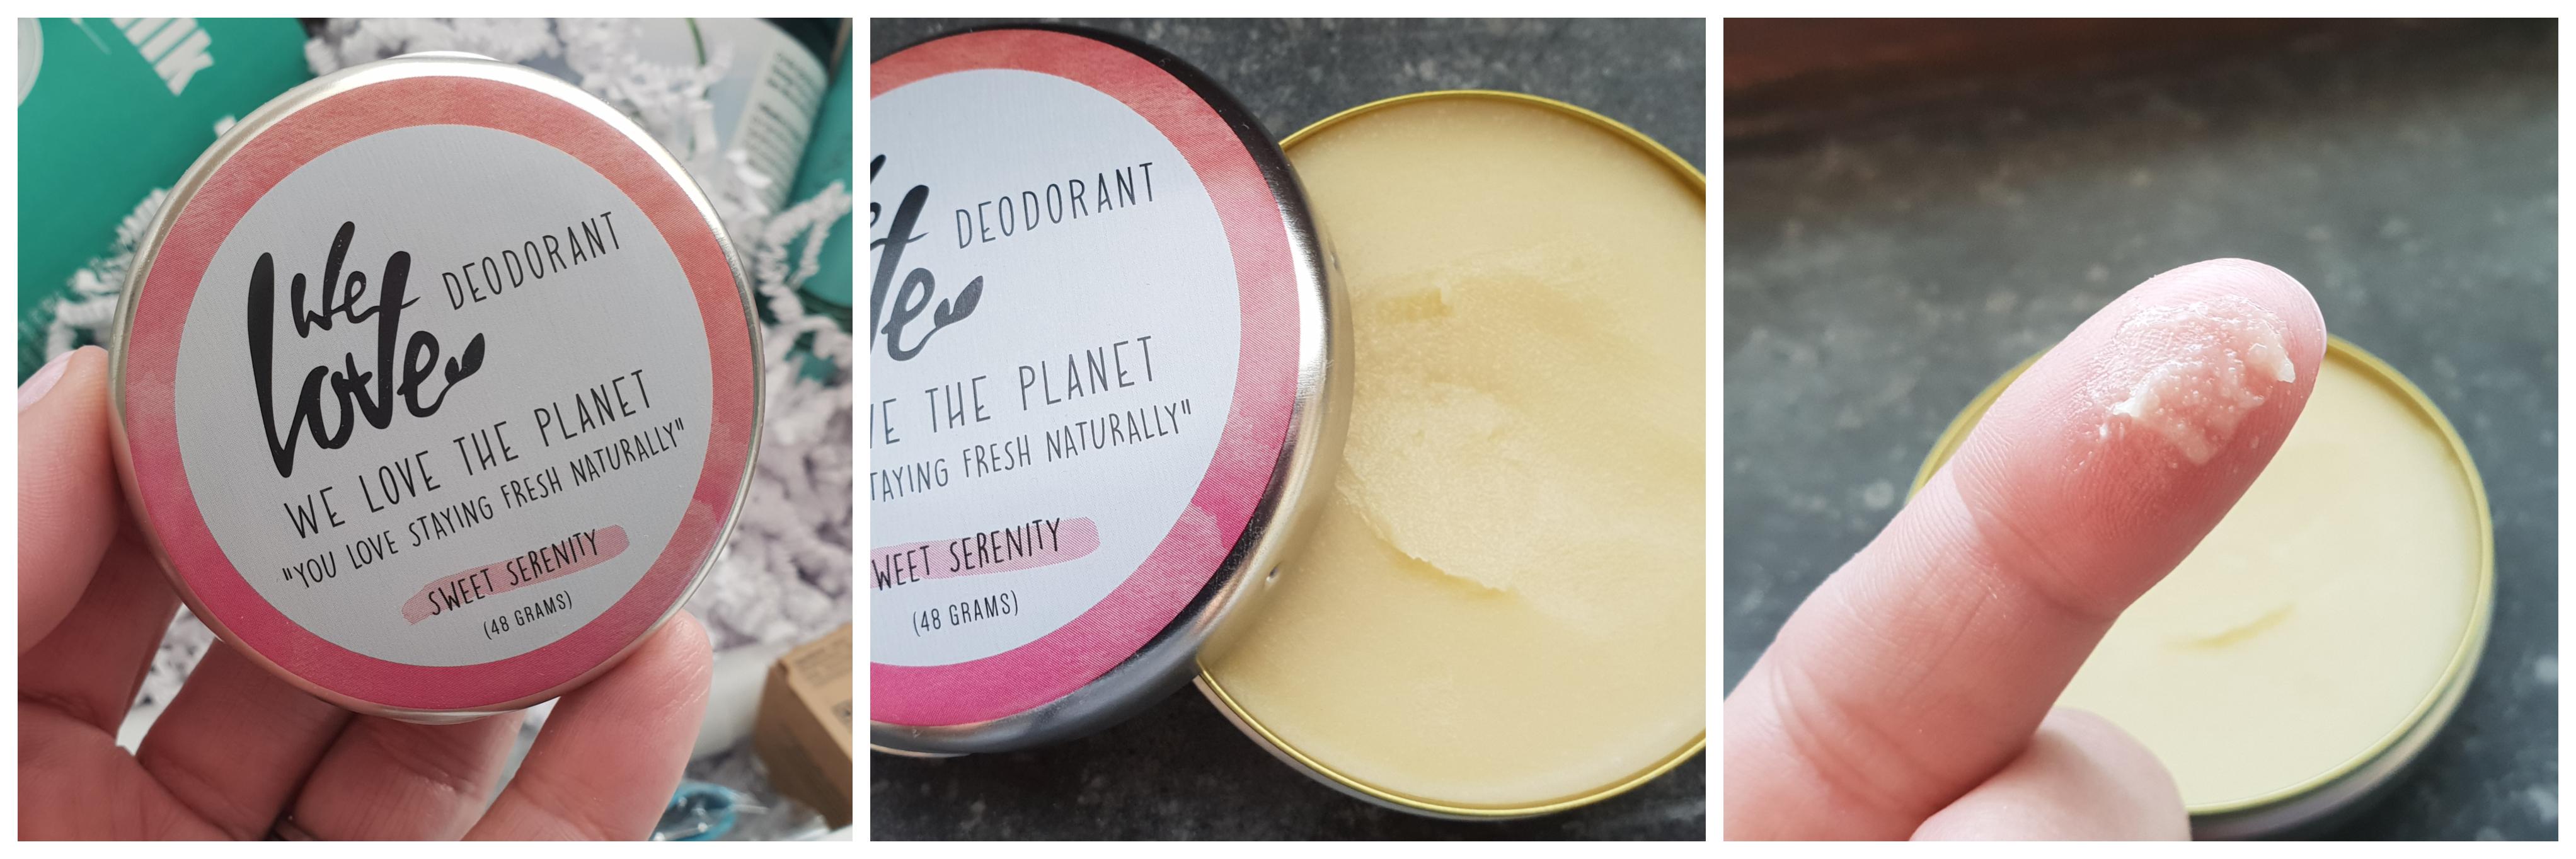 We Love The Planet deodorant